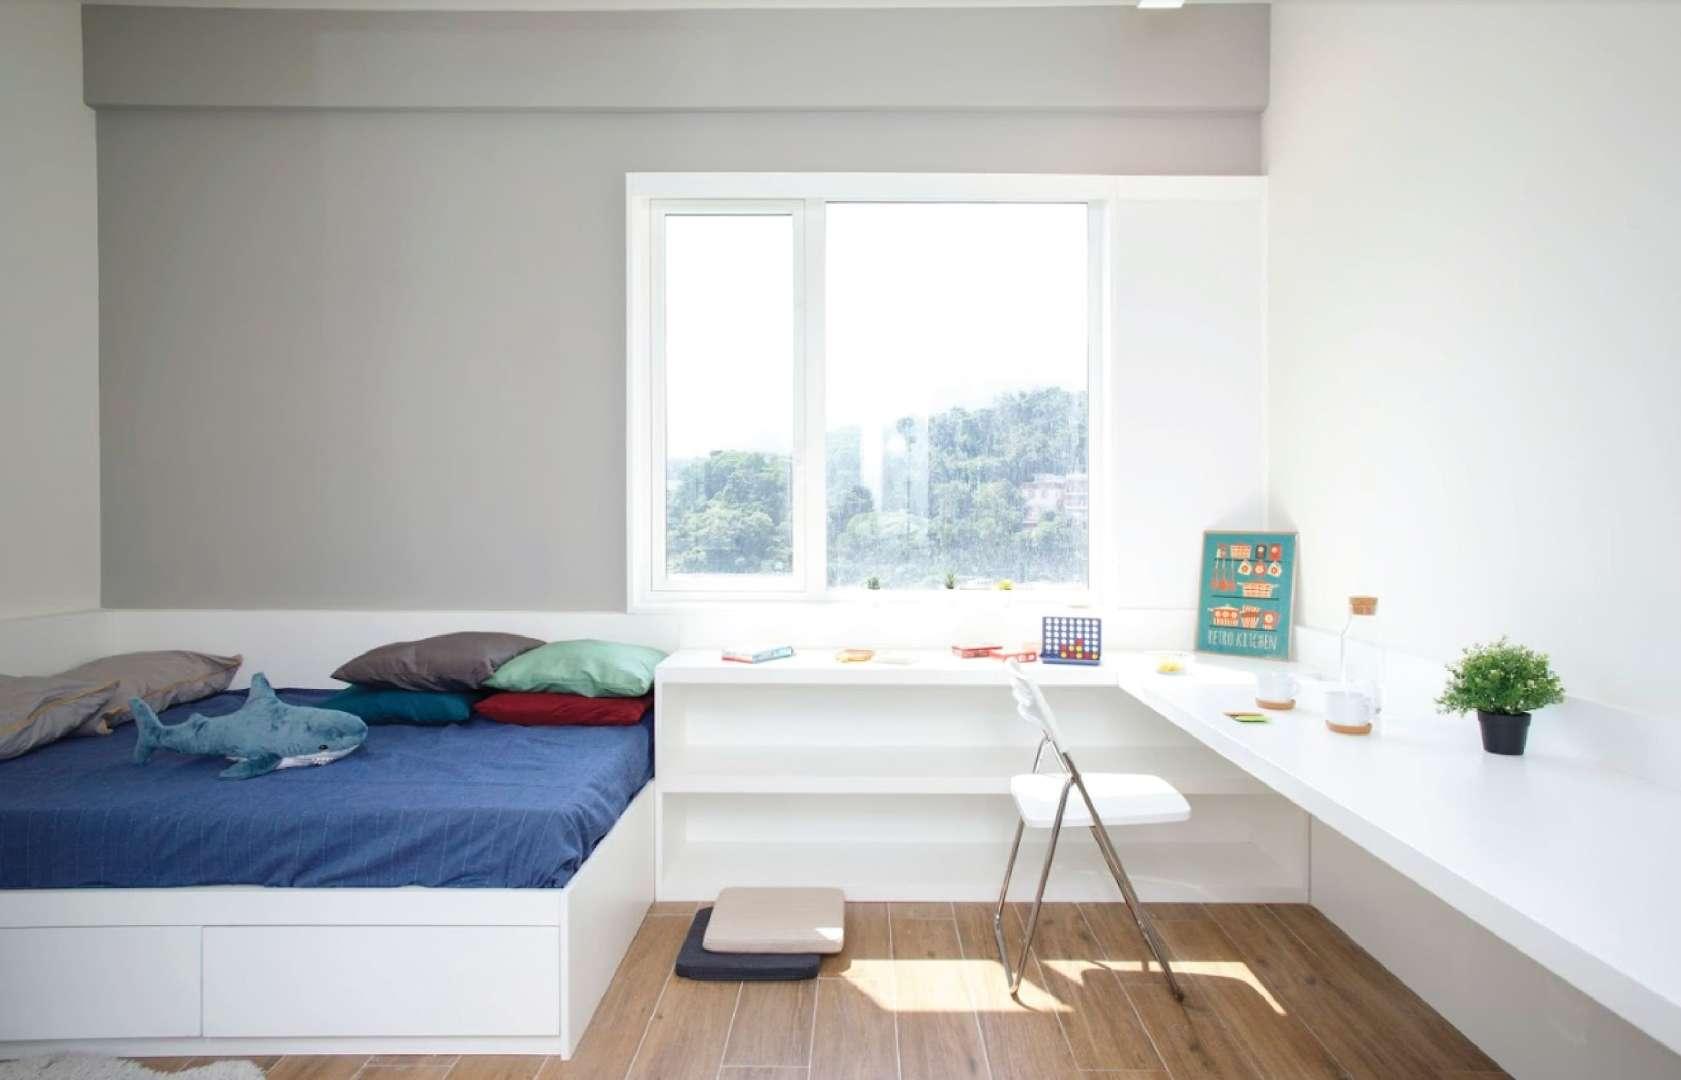 ph2 life room